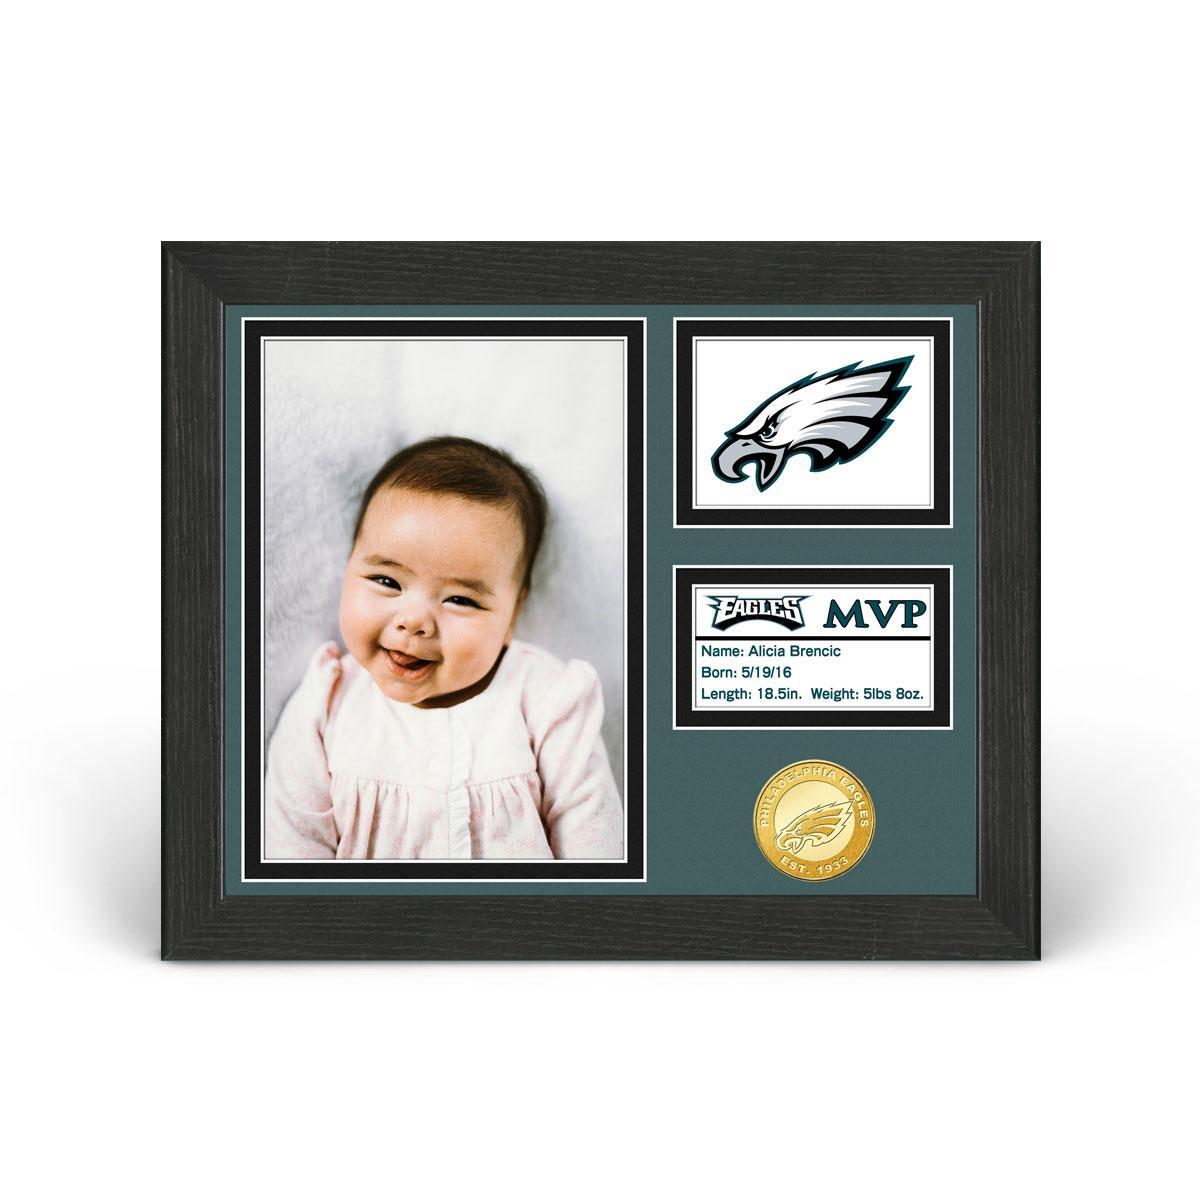 Philadelphia Eagles Baby MVP Personalized Photo Frame